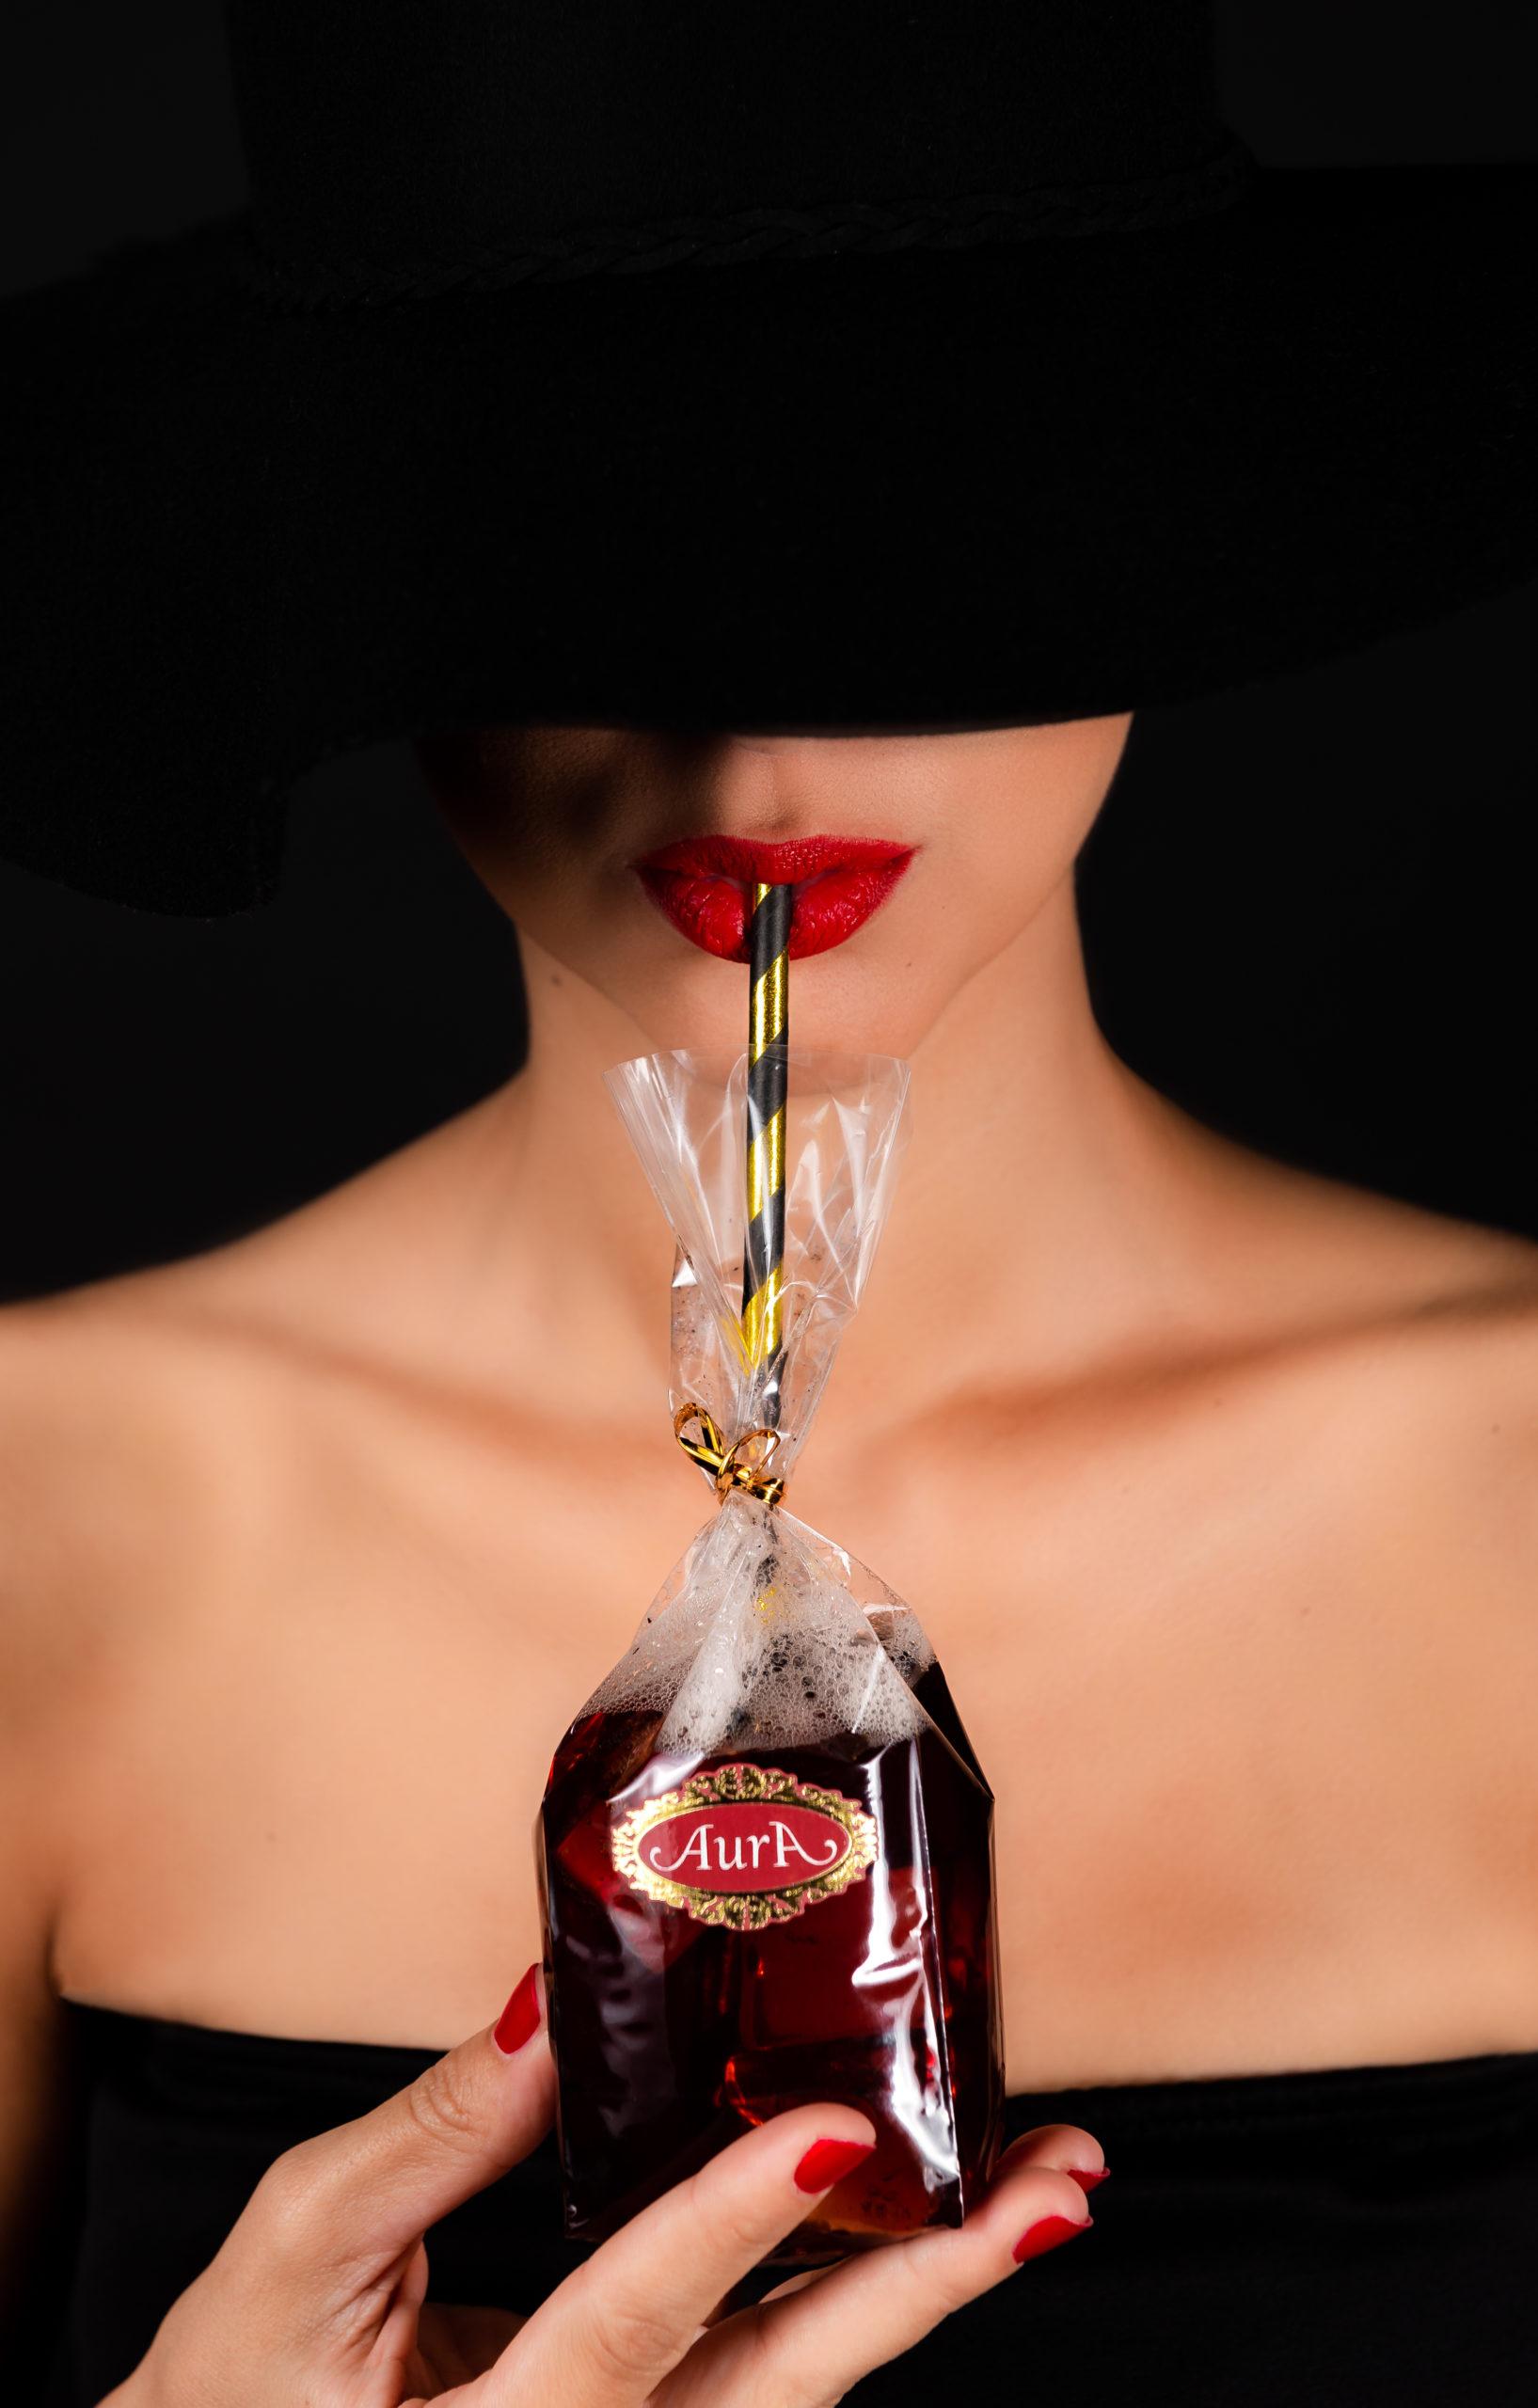 hren | plethora of creativity // Distillery Aura editorial photography